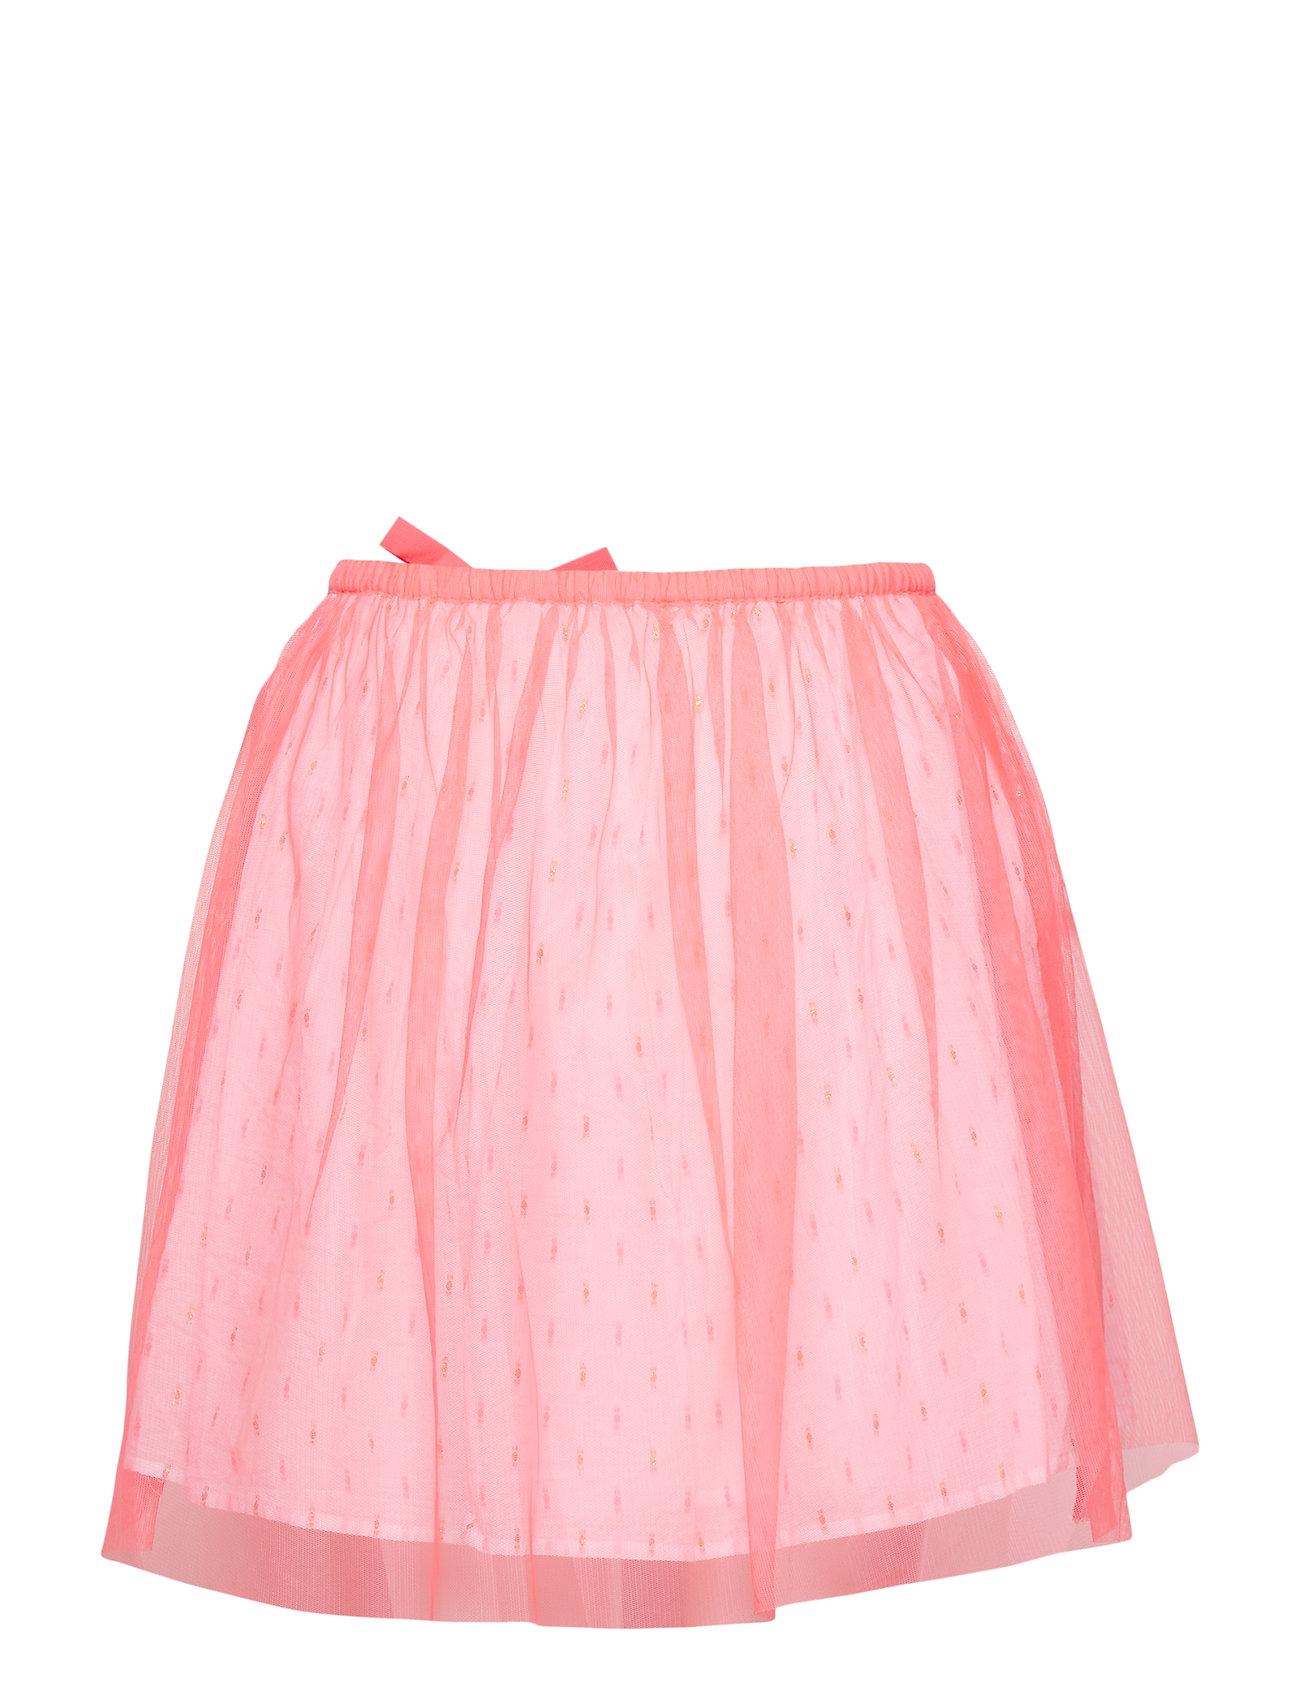 00f0d1c0748 Lyserød Billieblush Petticoat nederdele for børn - Pashion.dk